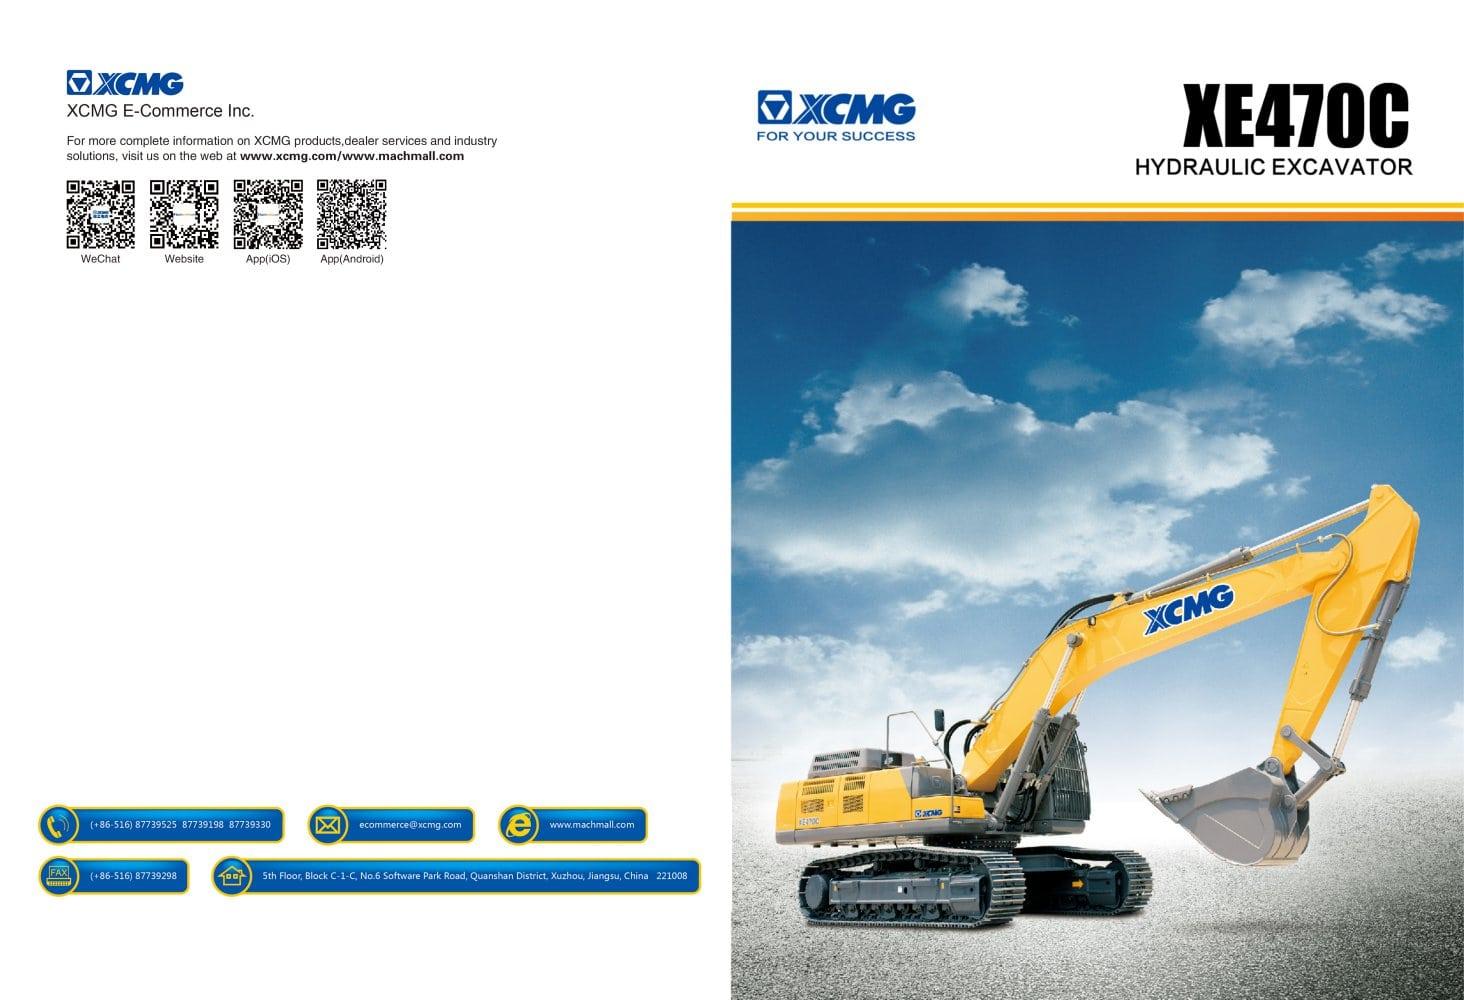 xcmg excavator xe470c construction xcmg pdf catalogs technical